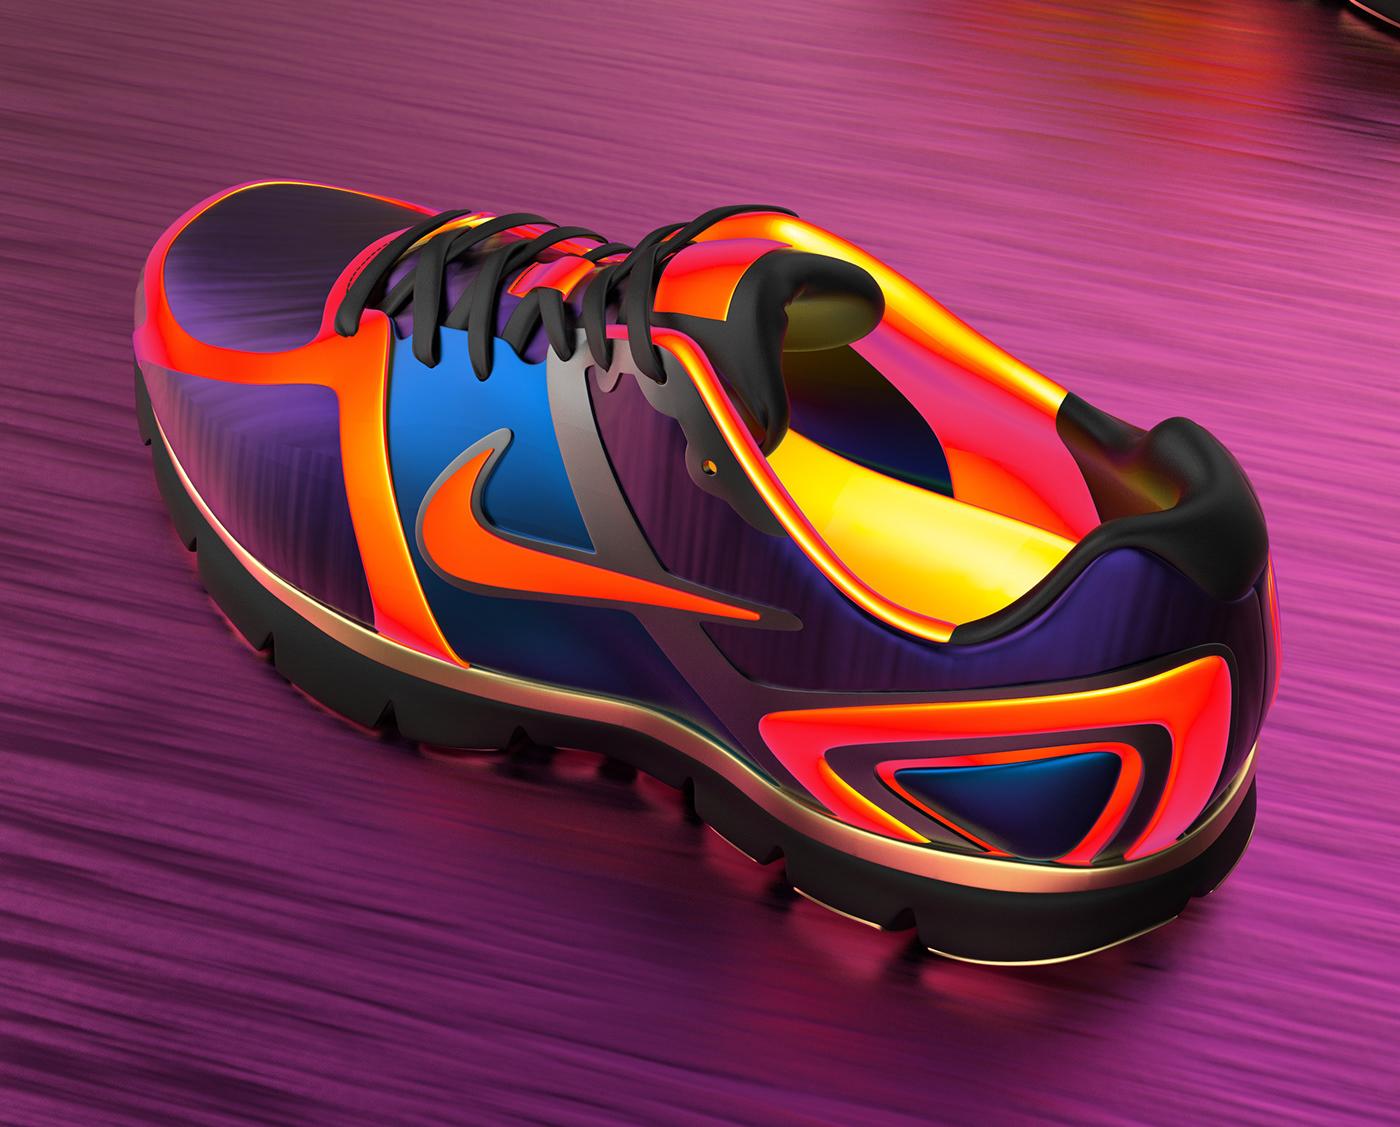 3d artist 3dshoe art direction  Art Director blender 3d instagram Nike product design  Product Rendering Sportswear